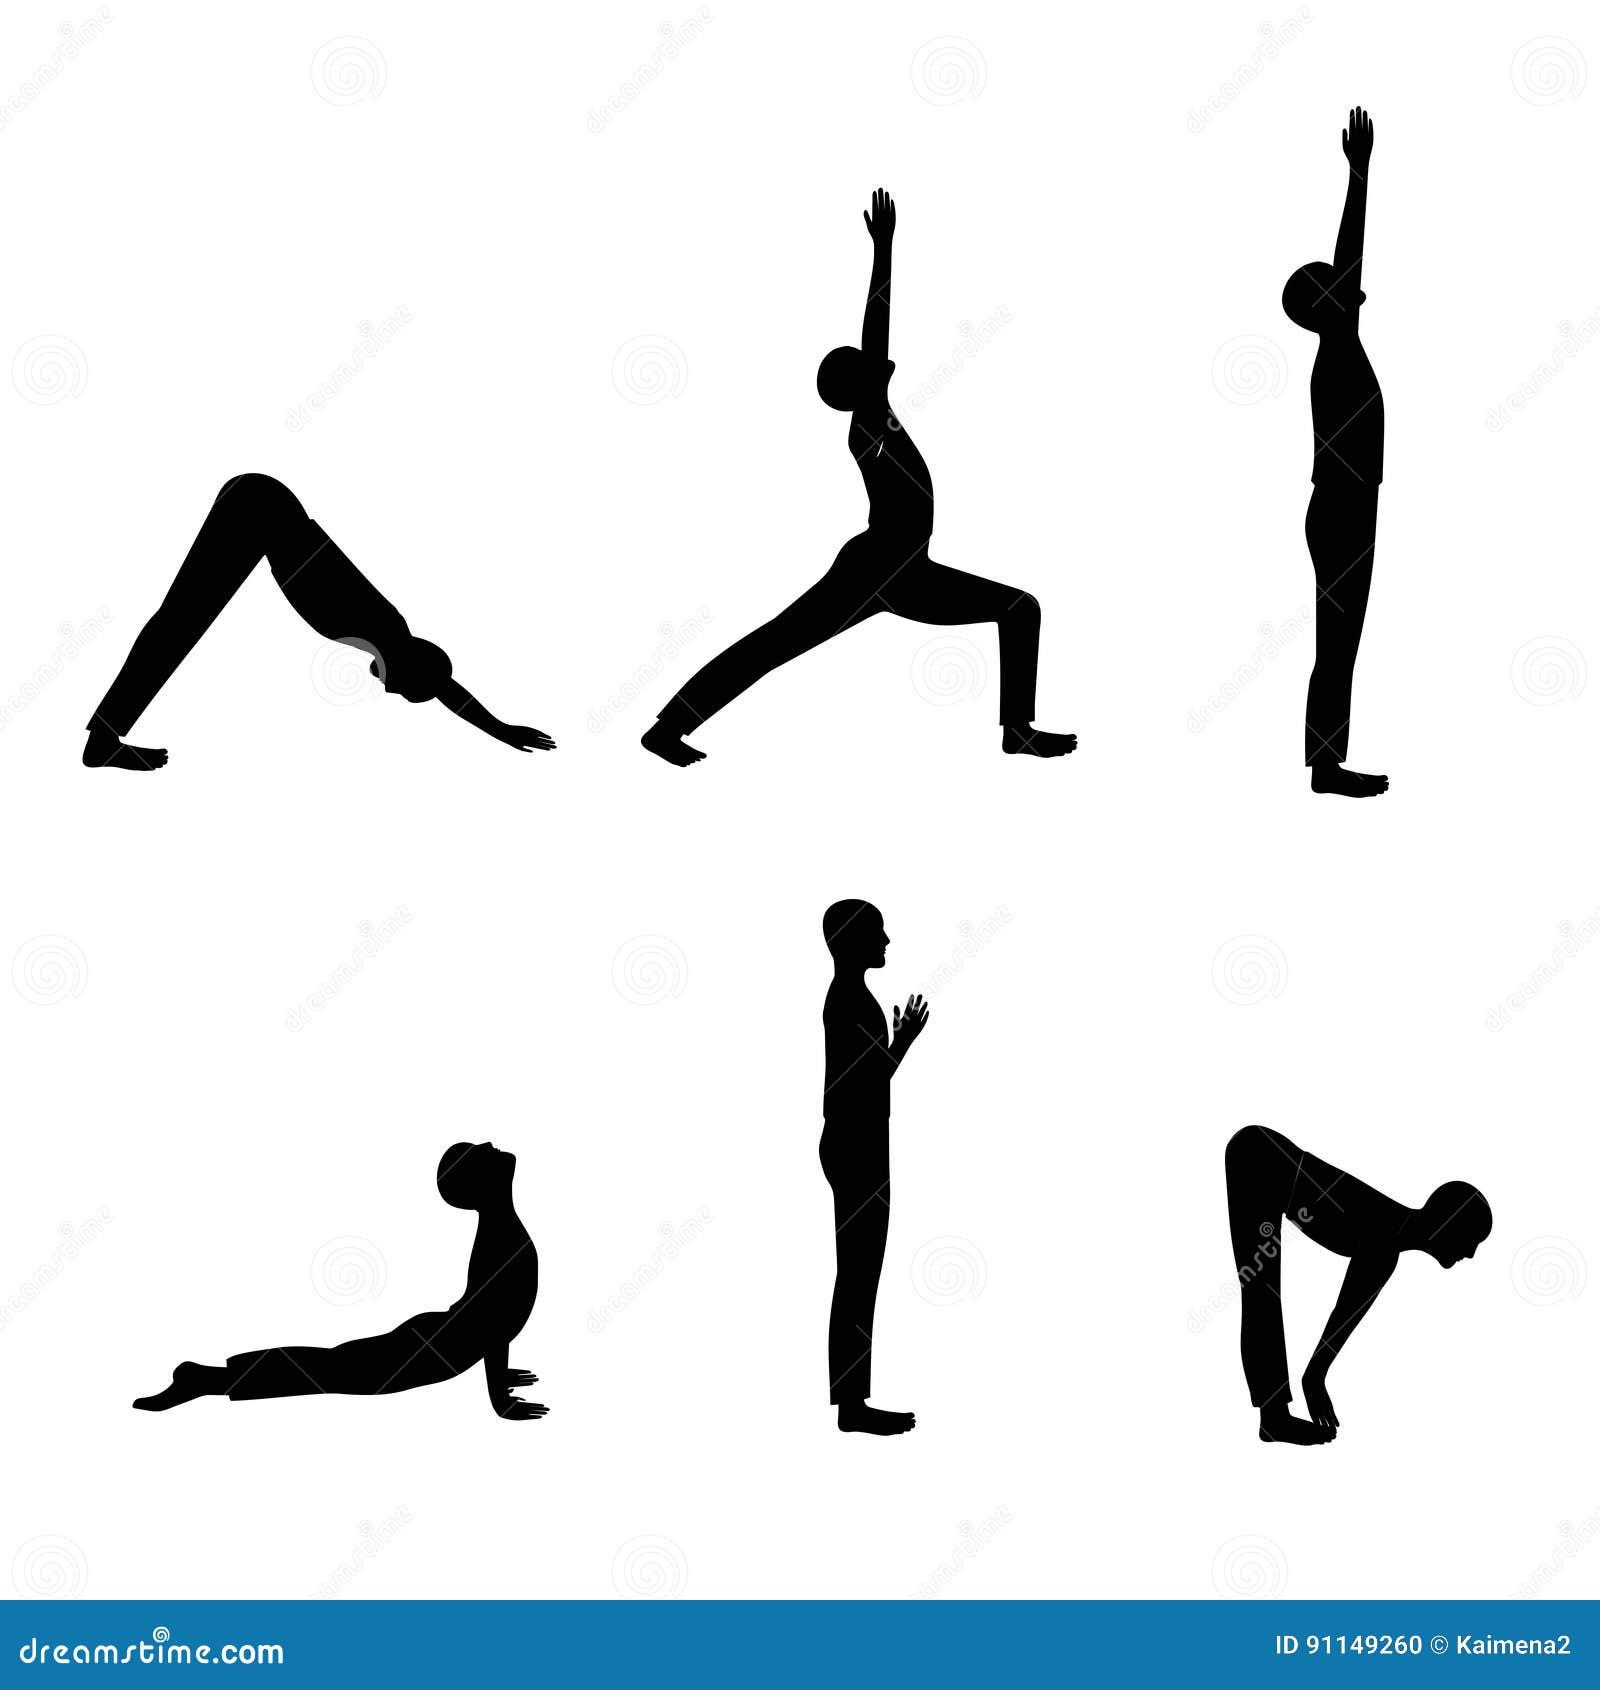 Black White Yoga Poses Stock Illustrations – 32 Black White Yoga